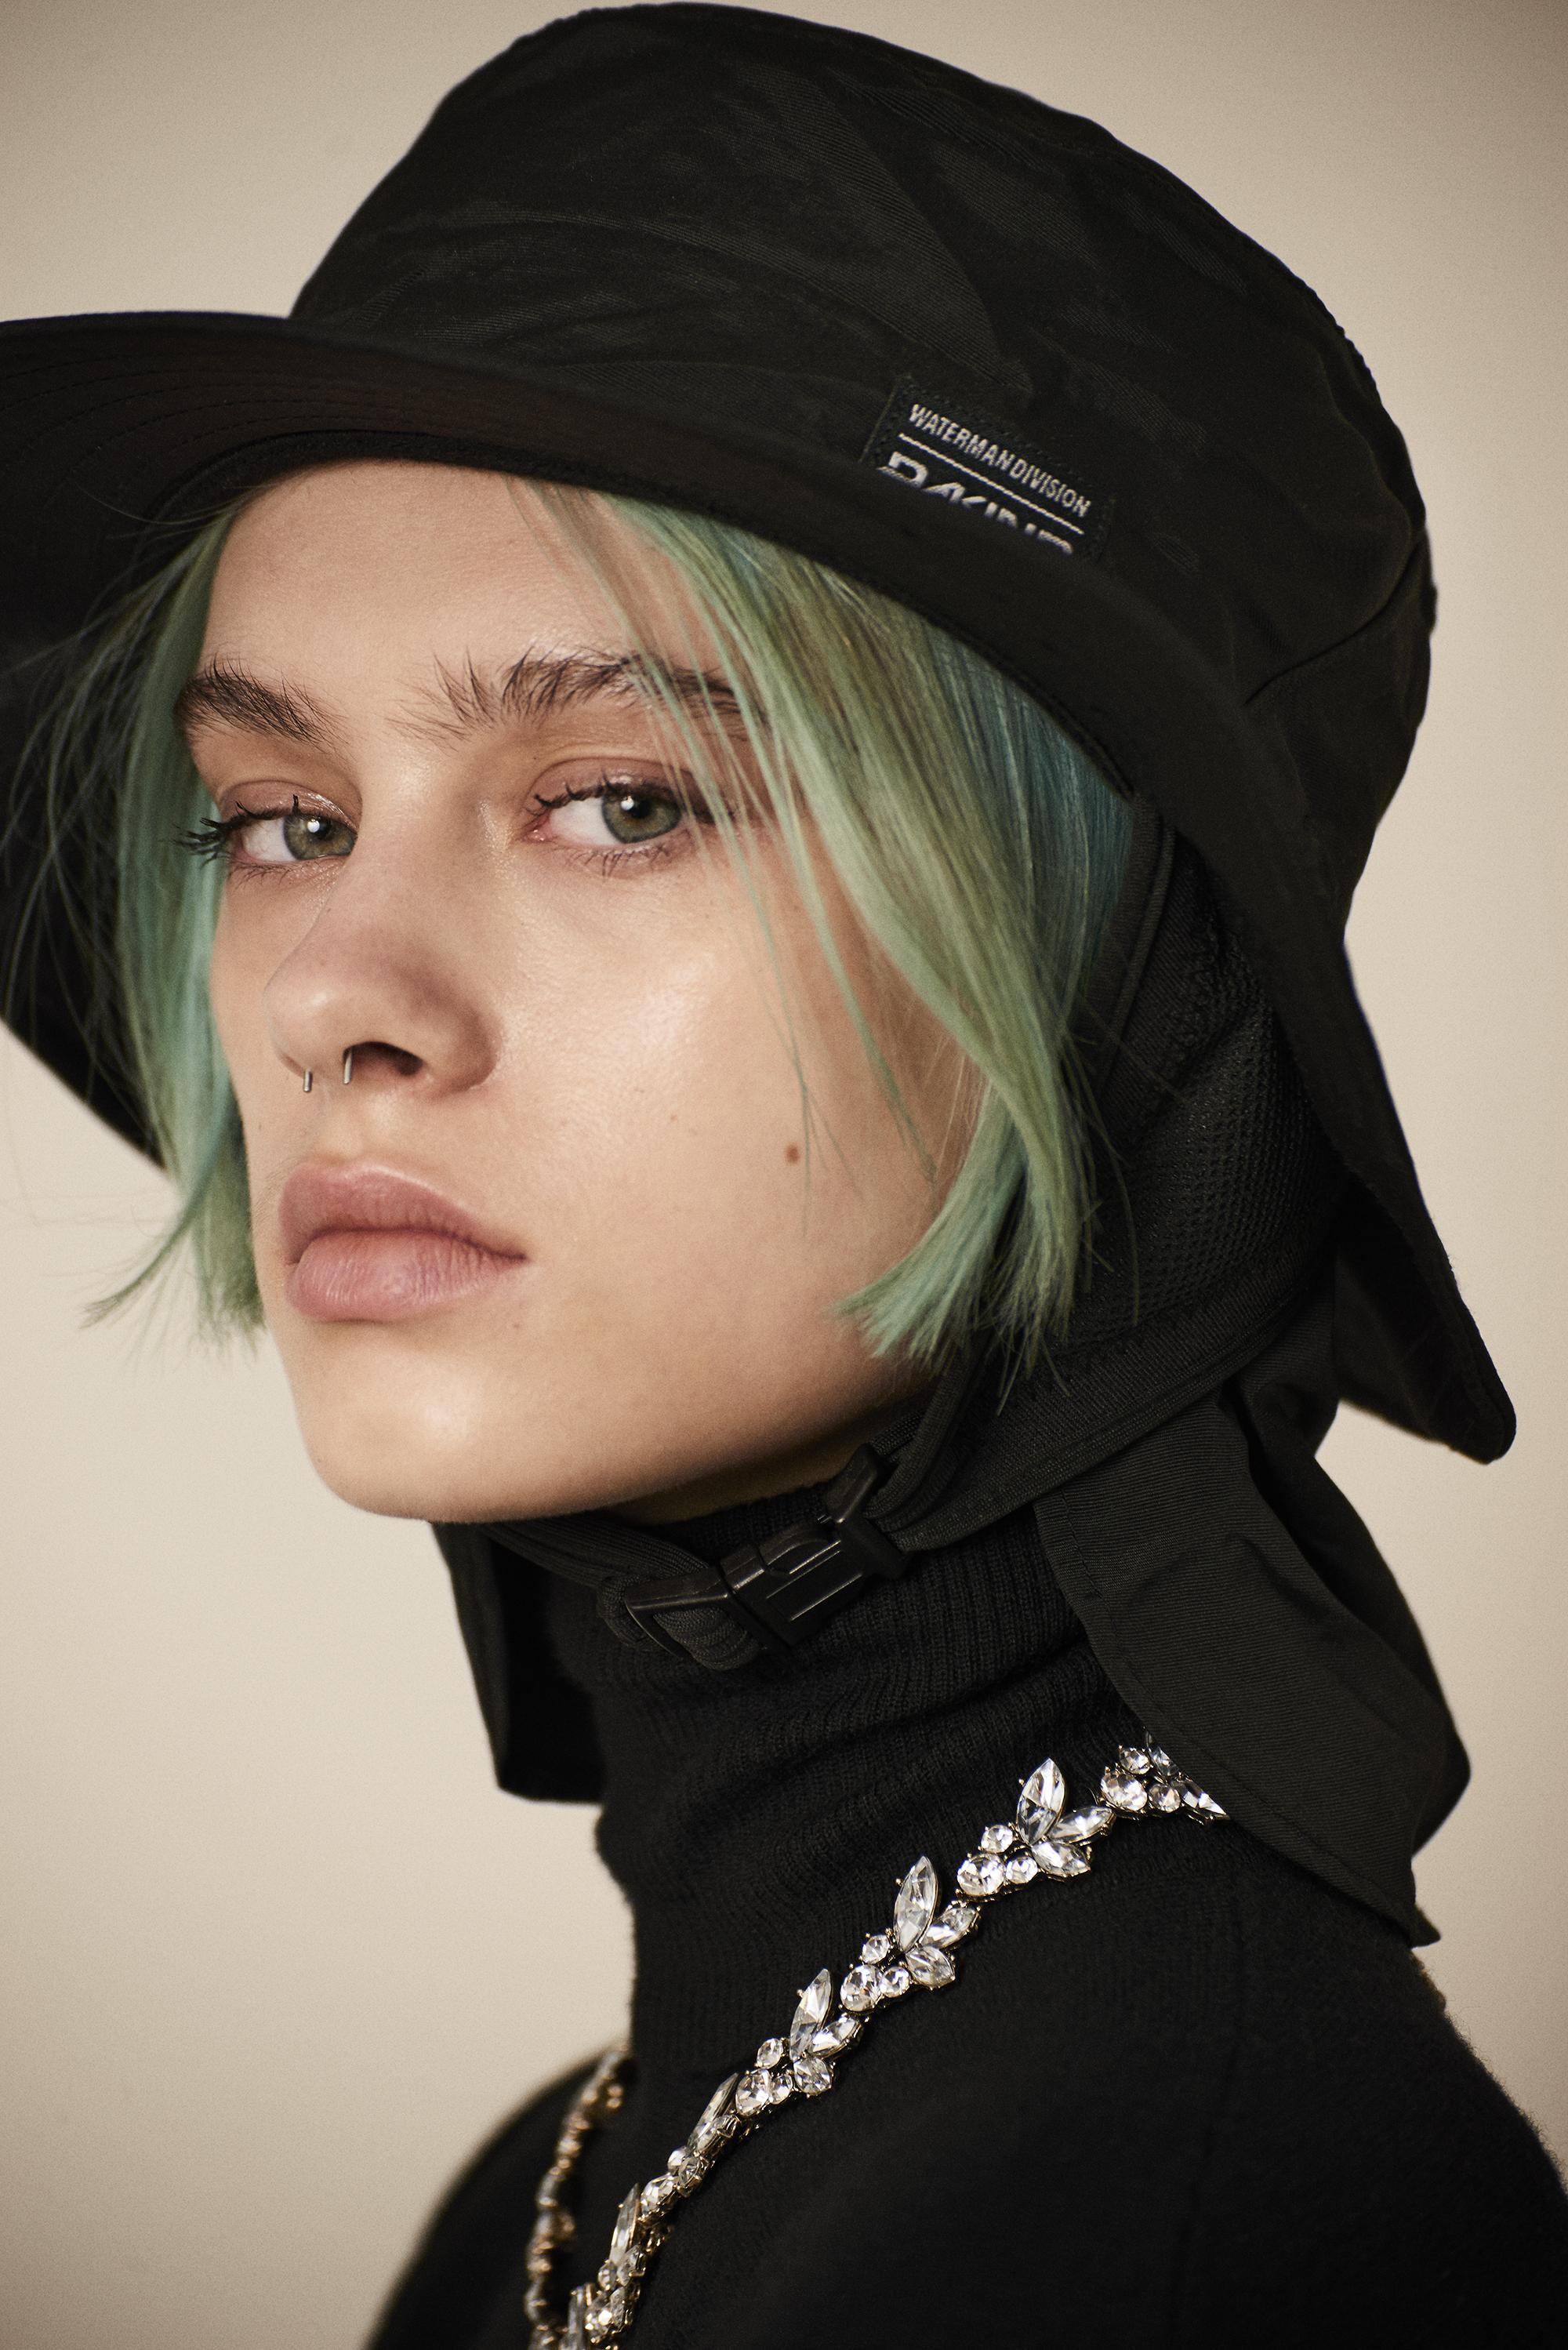 Turtle neck wool sweater  Saint Laurent . Hat  Dakine . Necklace  Givenchy